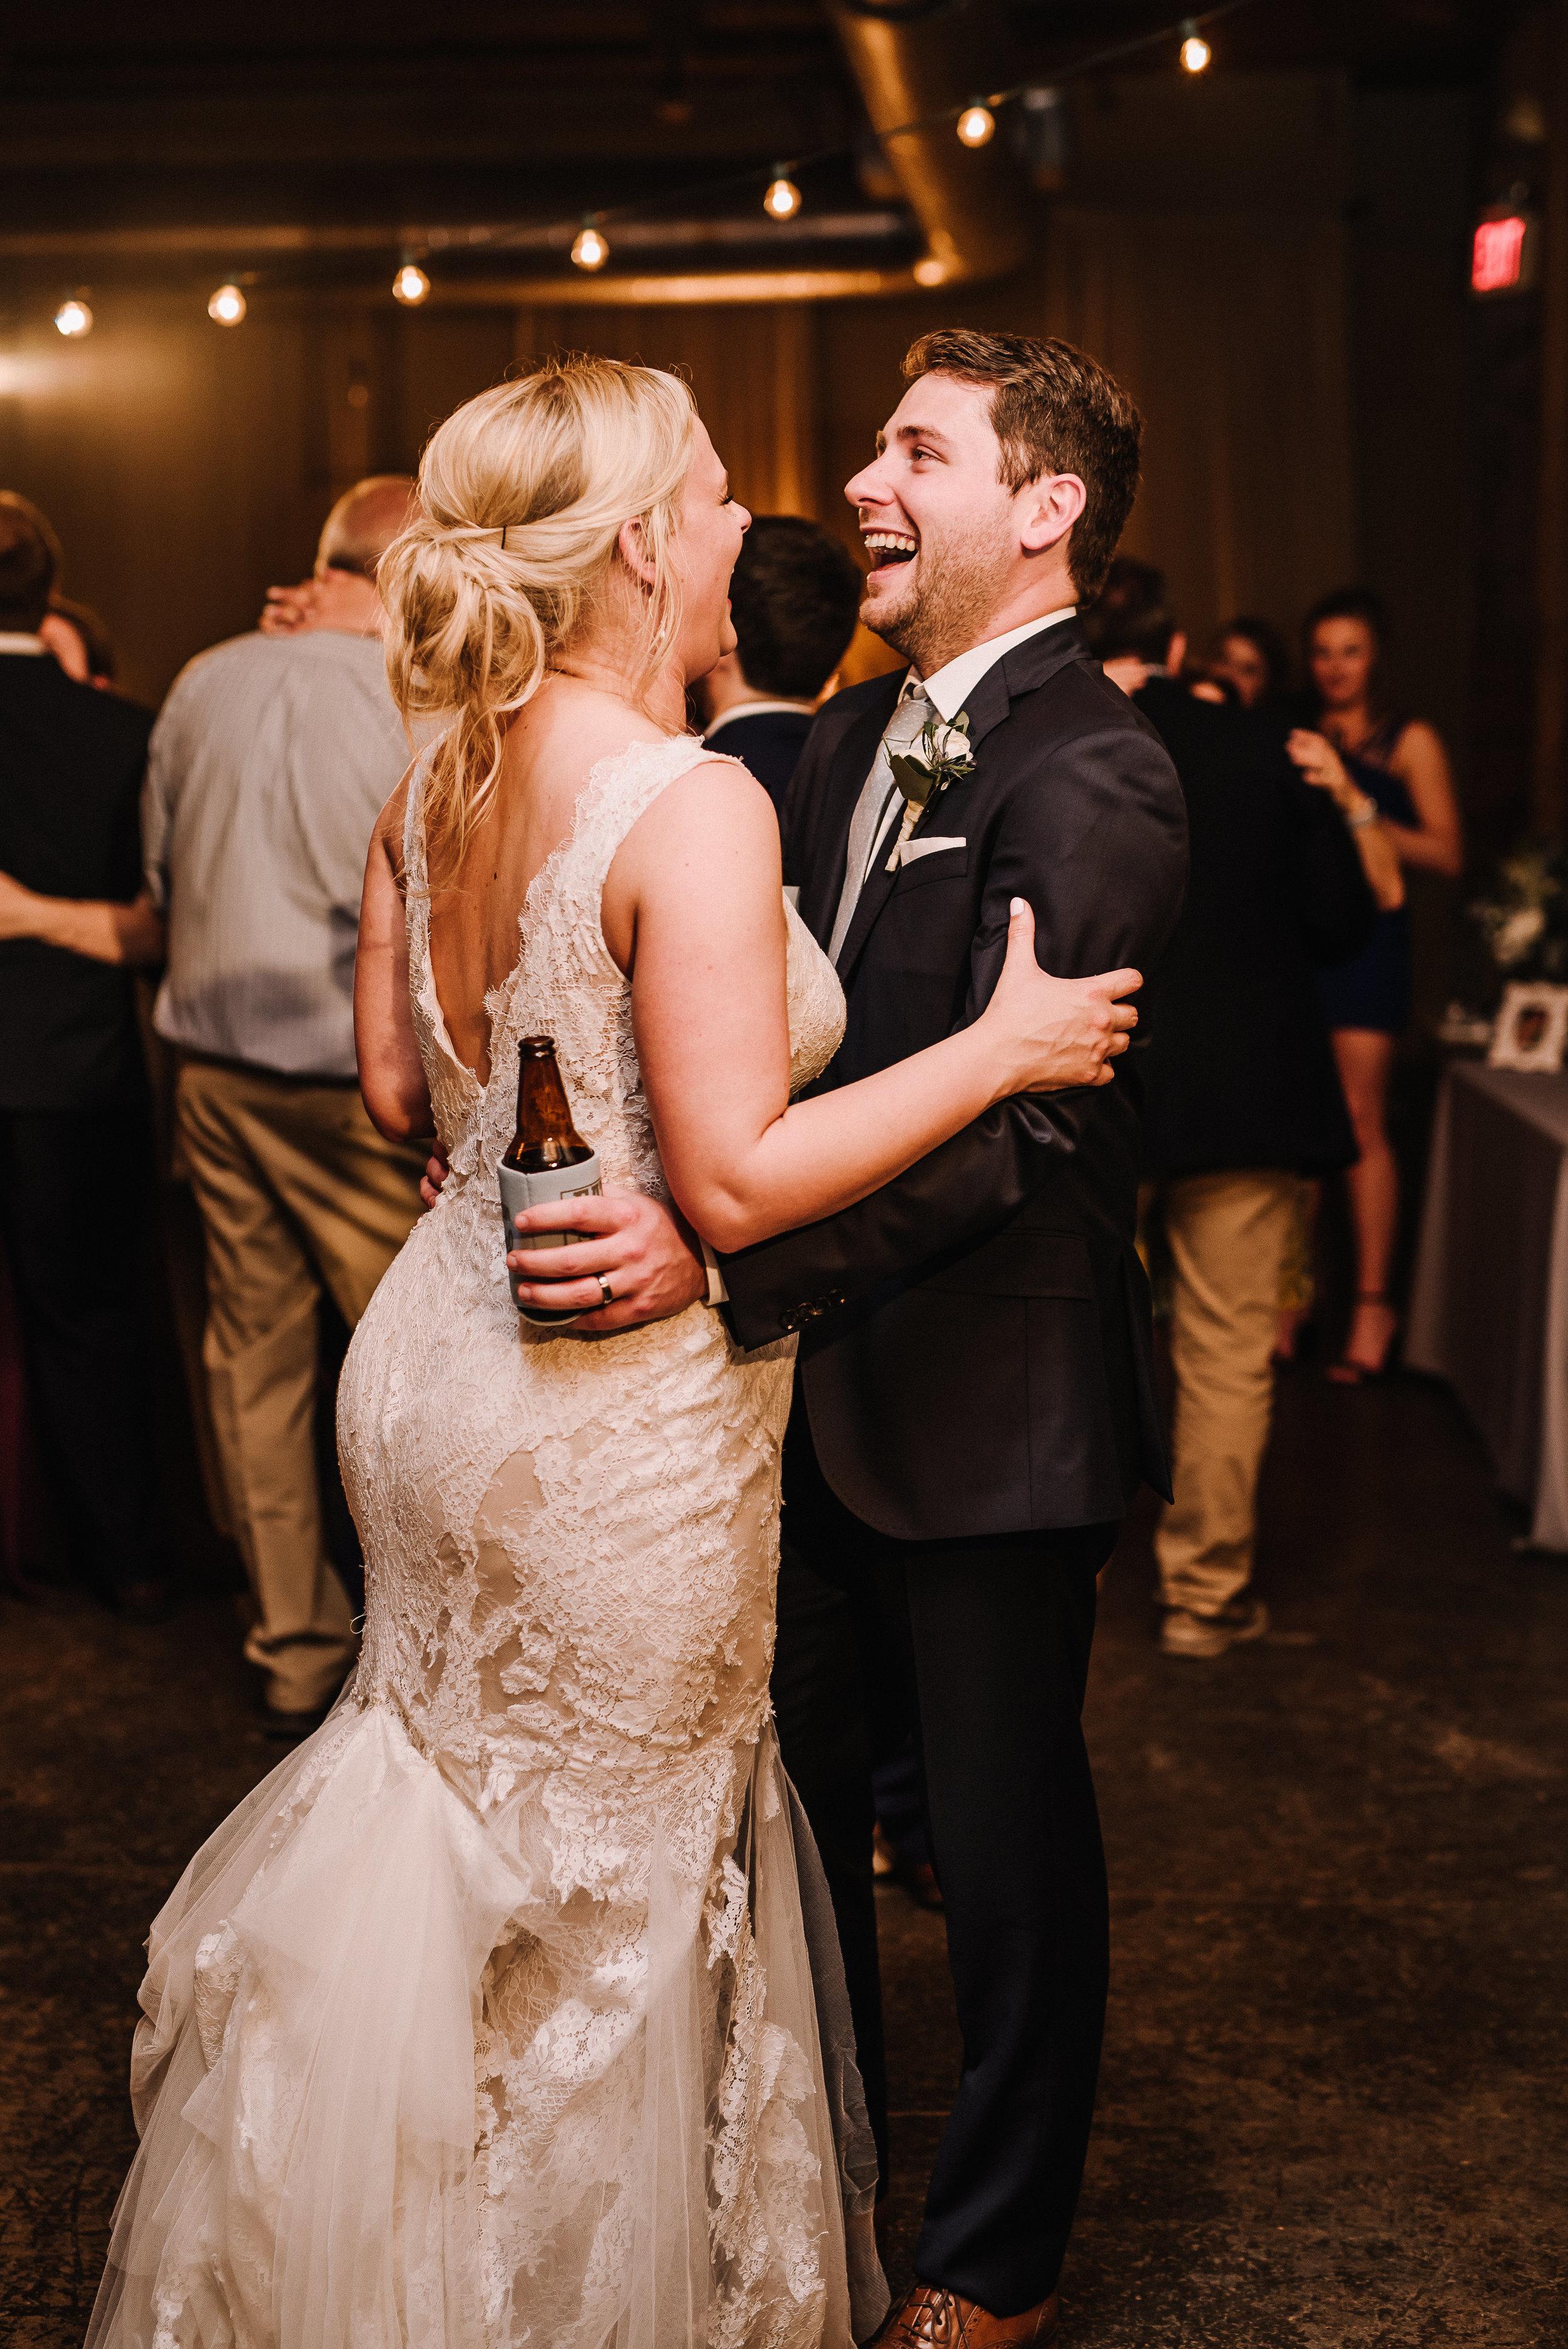 Morgan Wedding_Mill at Yellow River_Ashley Benham Photography-1169.jpg